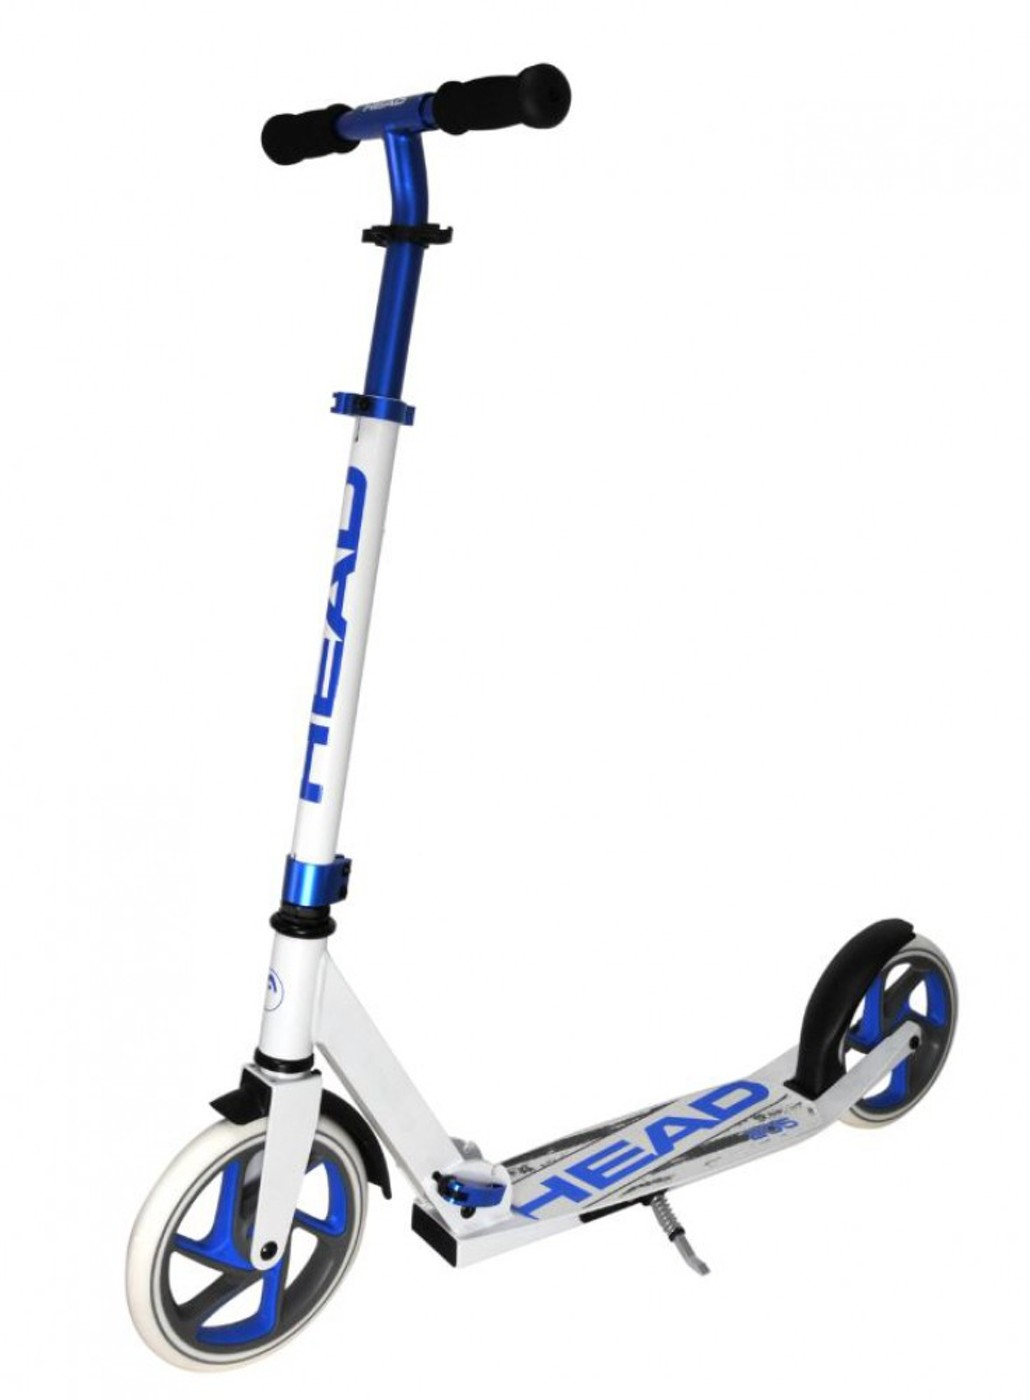 HEAD Urban Scooter 205mm